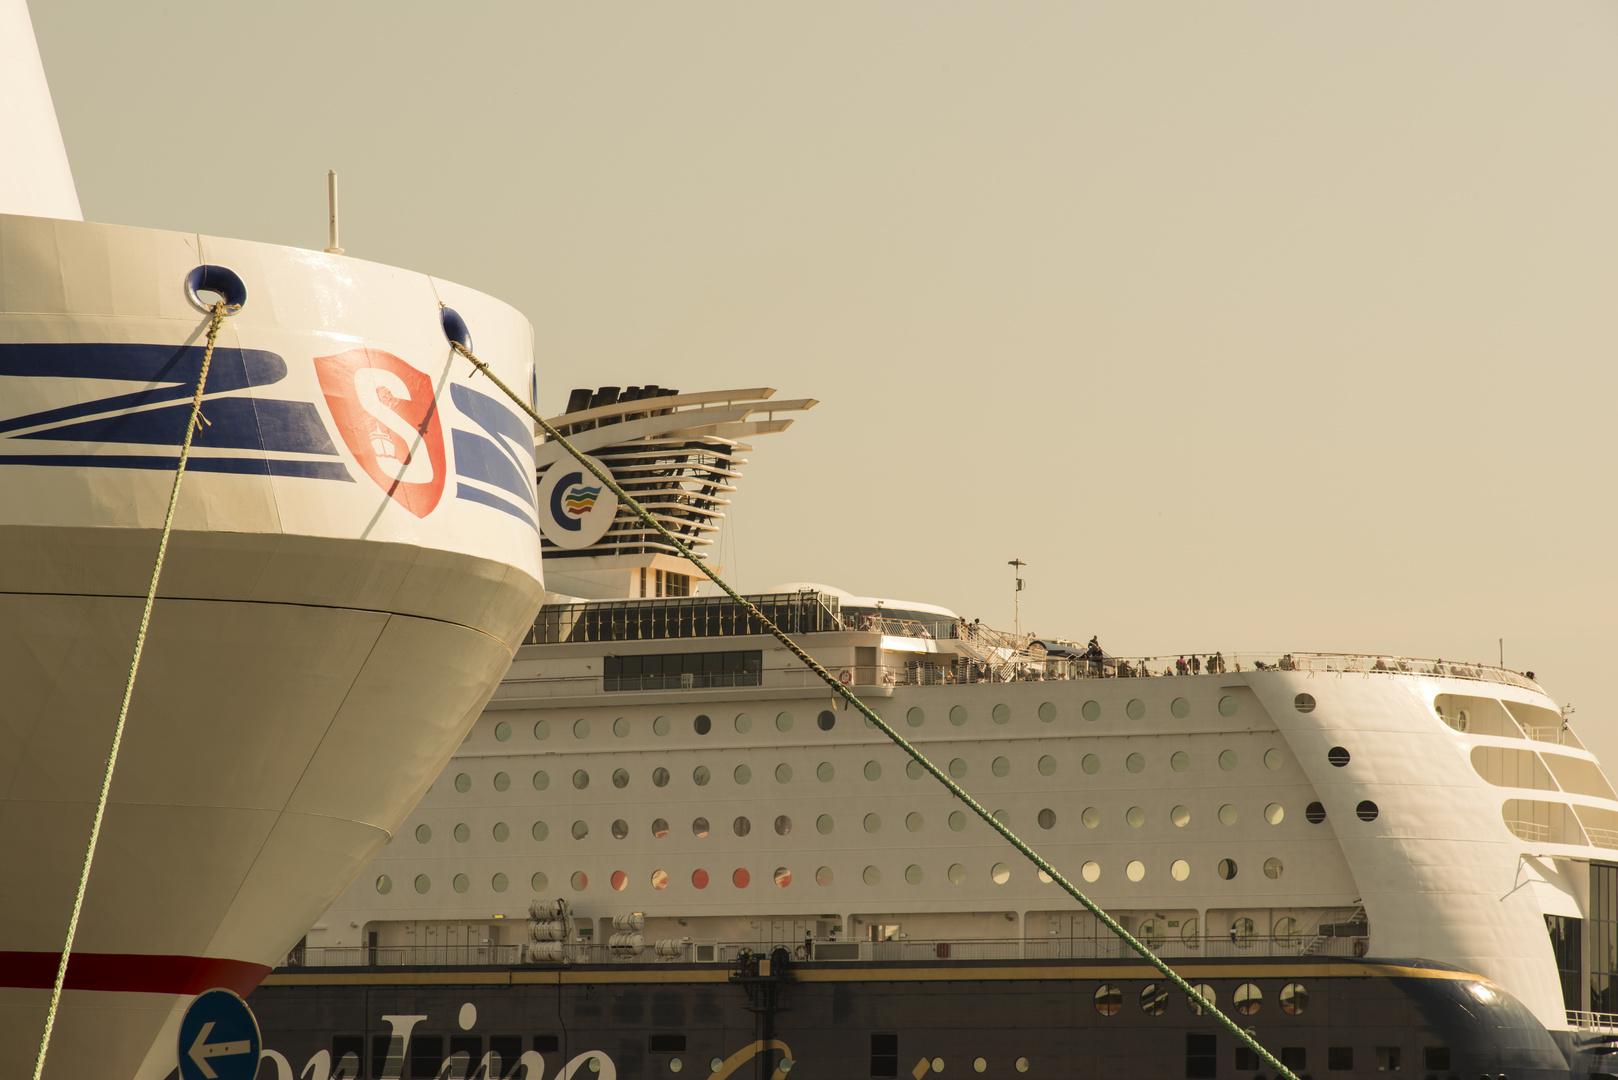 Fähren in Kiel